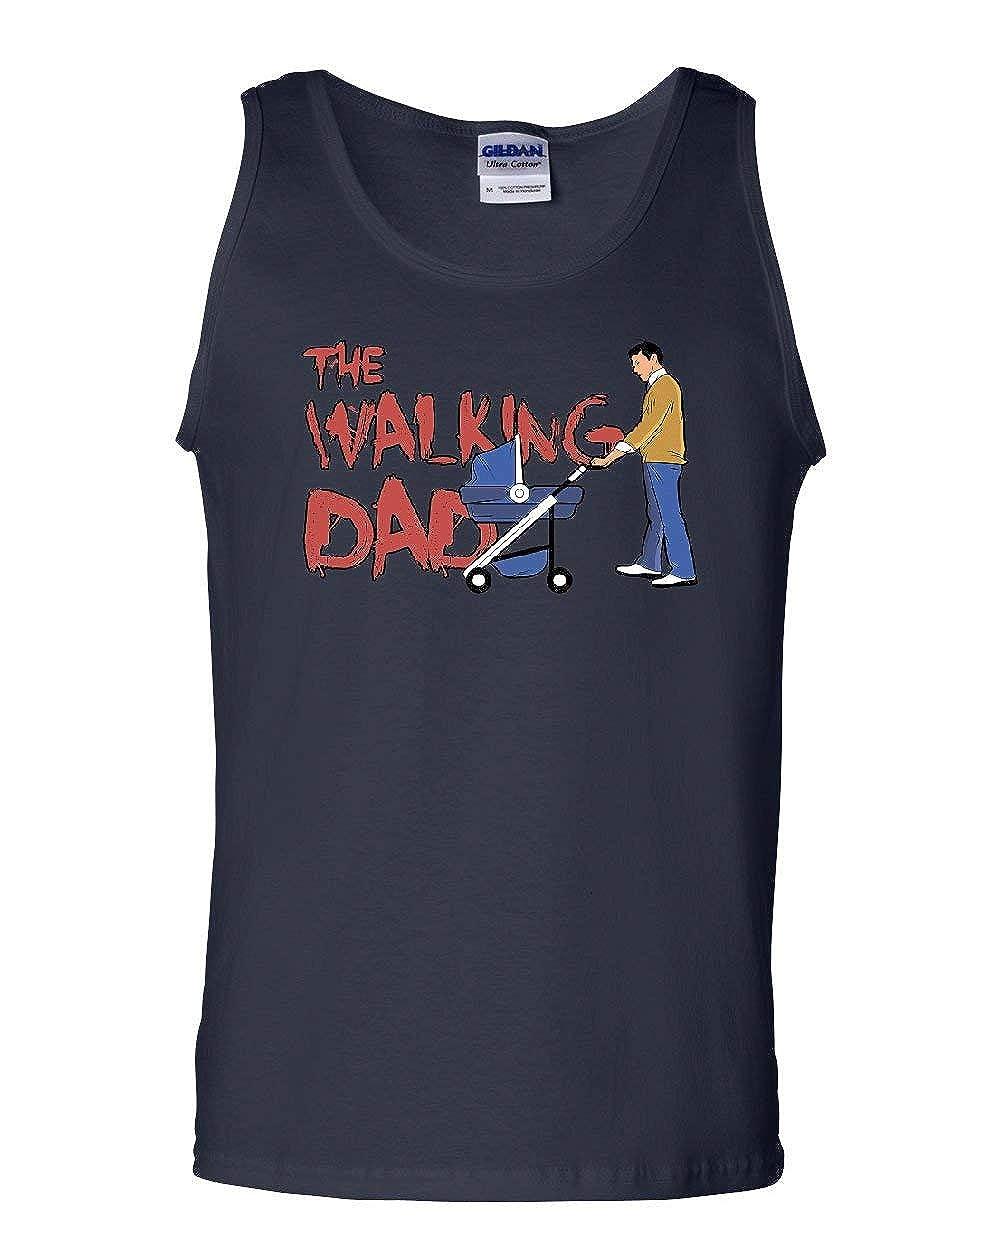 The Walking Dad Tank Top Fathers Day Parody Zombie Apocalypse Sleeveless